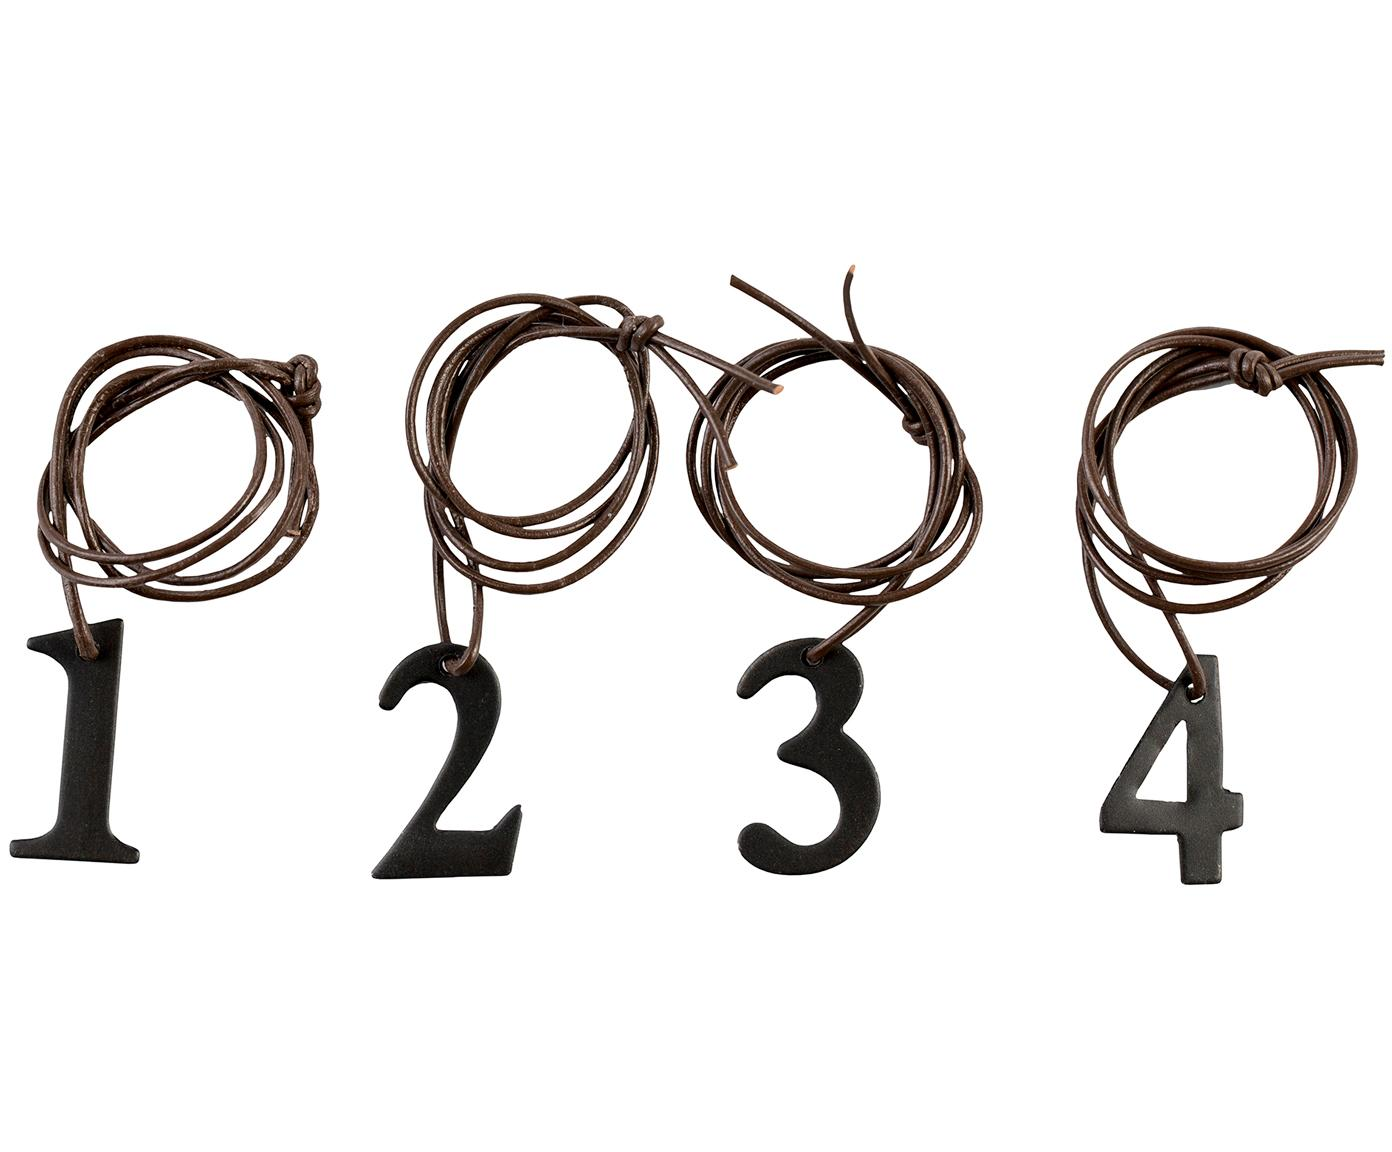 Kerzen-Anhänger-Set Dana Advent Number, 4-tlg., Schwarz, Braun, 2 x 3 cm